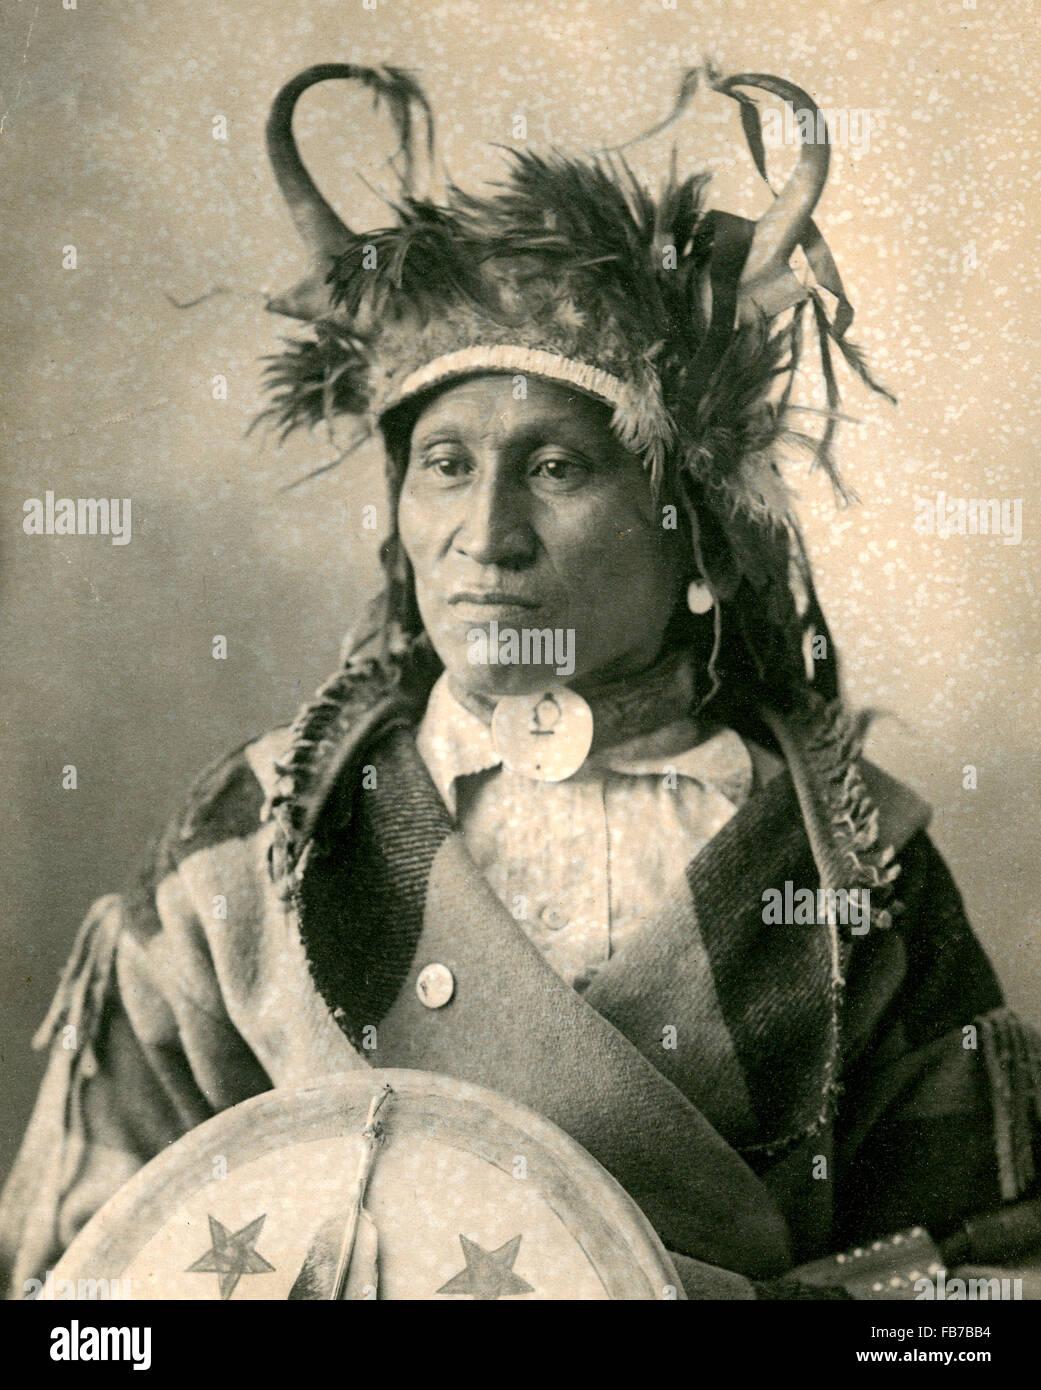 native american indian chief wetsit assiniboine indian stock